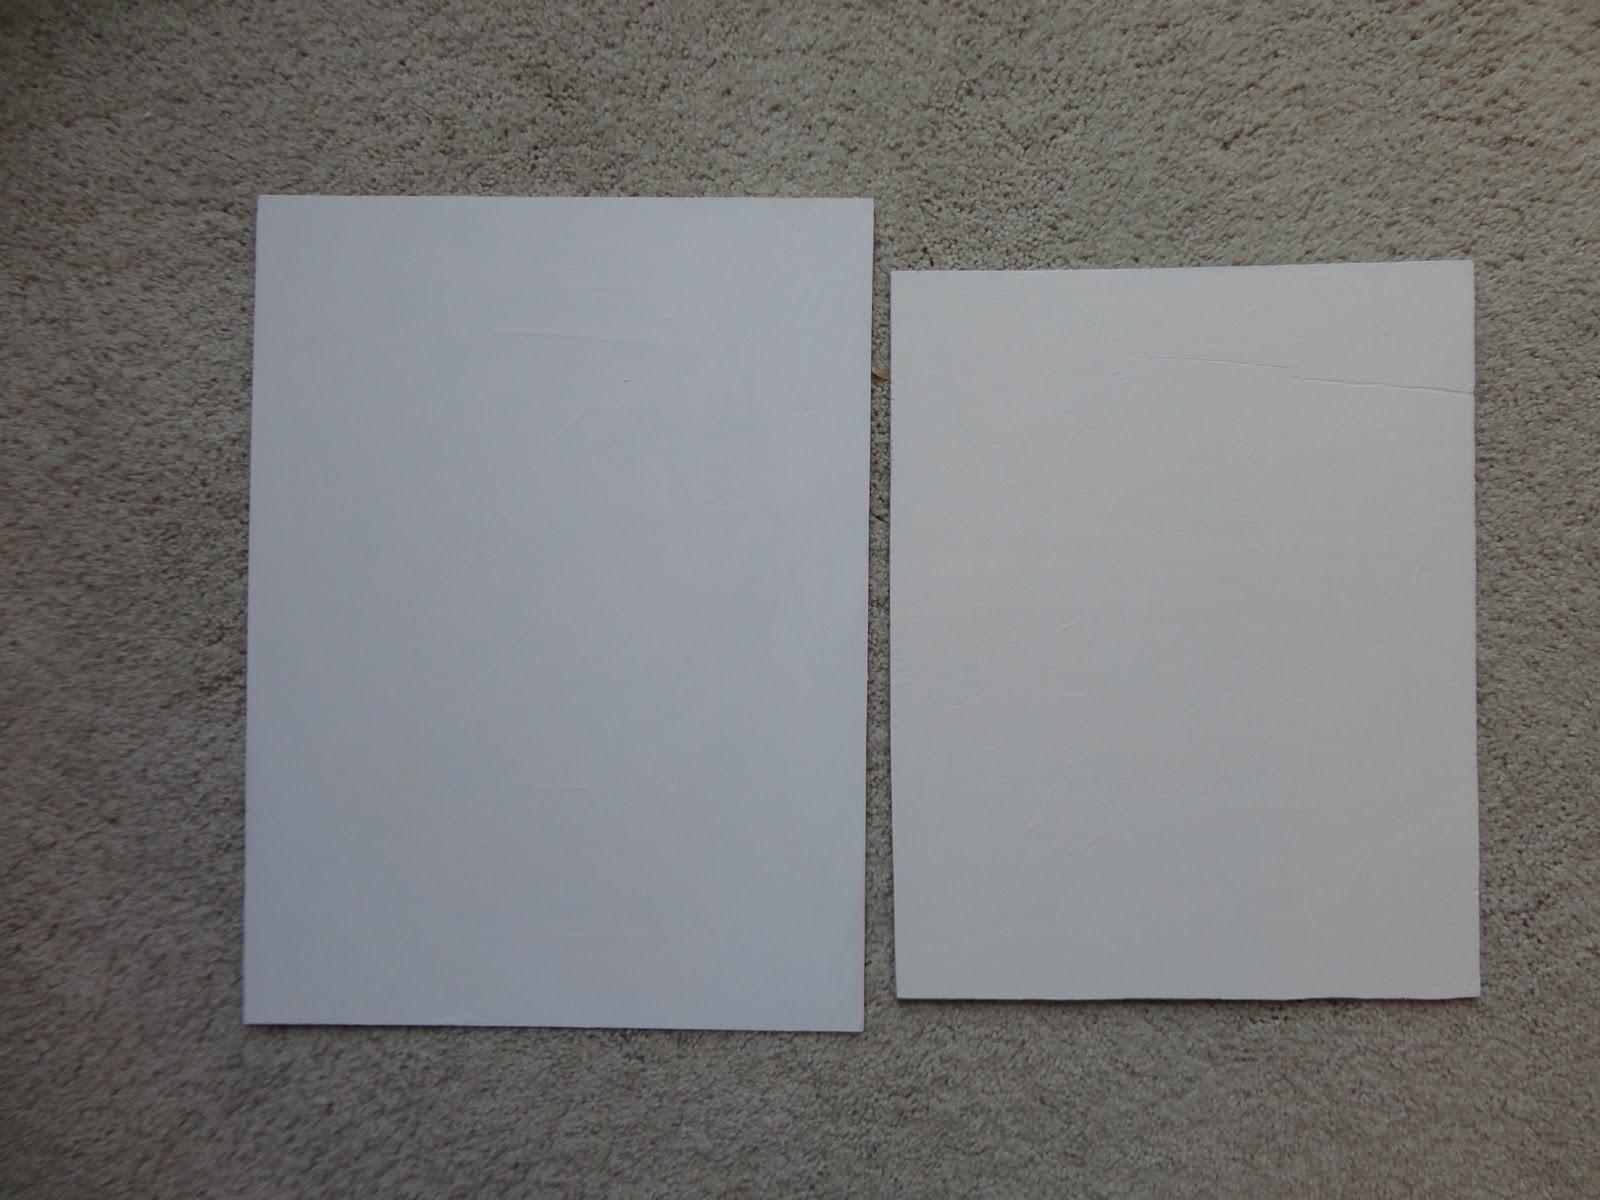 Hardboard Panel For Painting ~ Painting arkansas hardboard panel prep